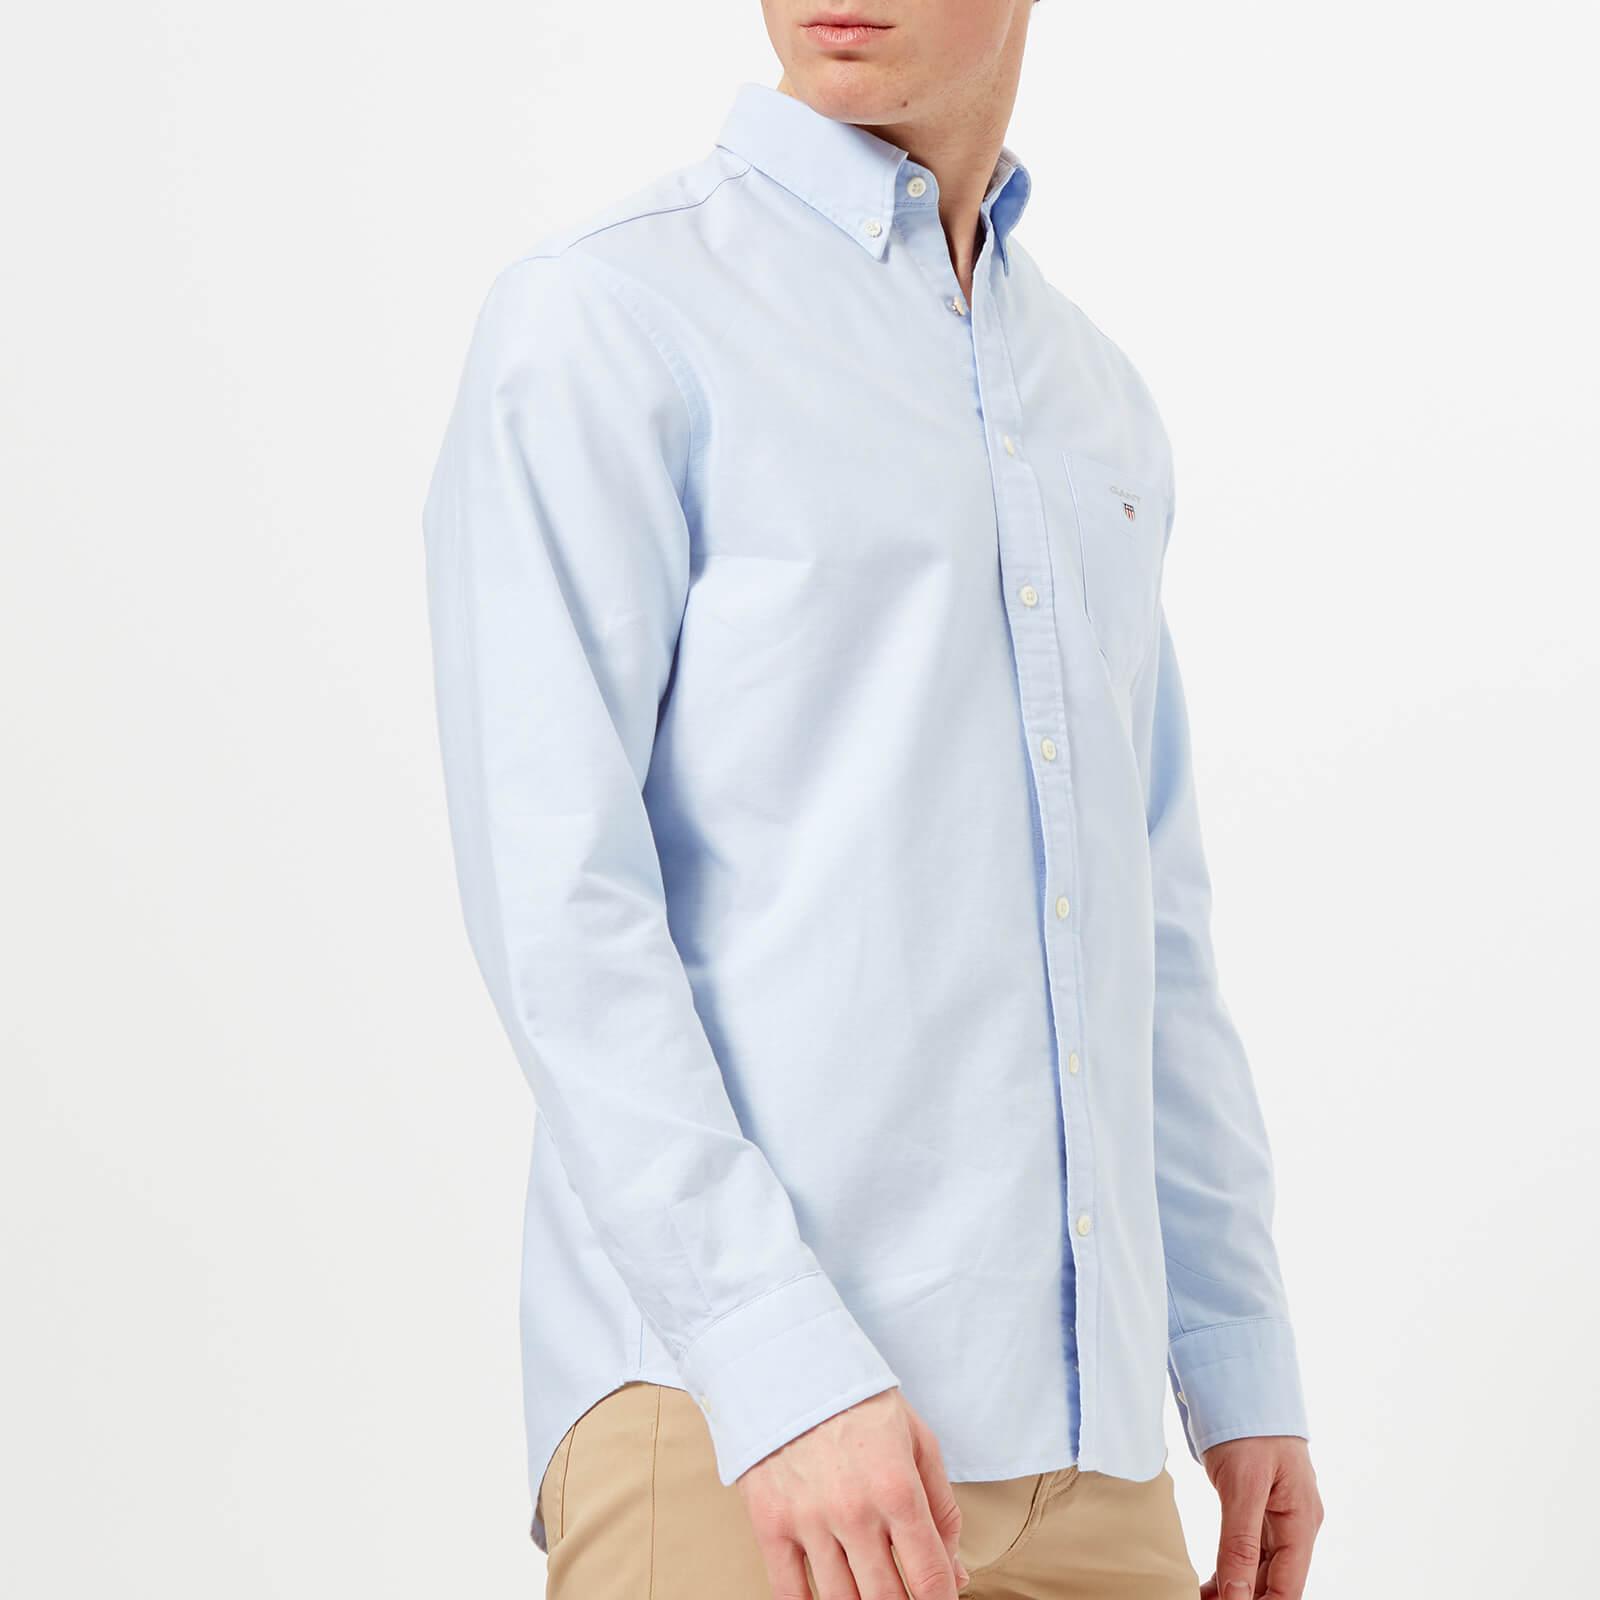 GANT Men's Oxford Long Sleeve Shirt - Capri Blue - XL - Blue